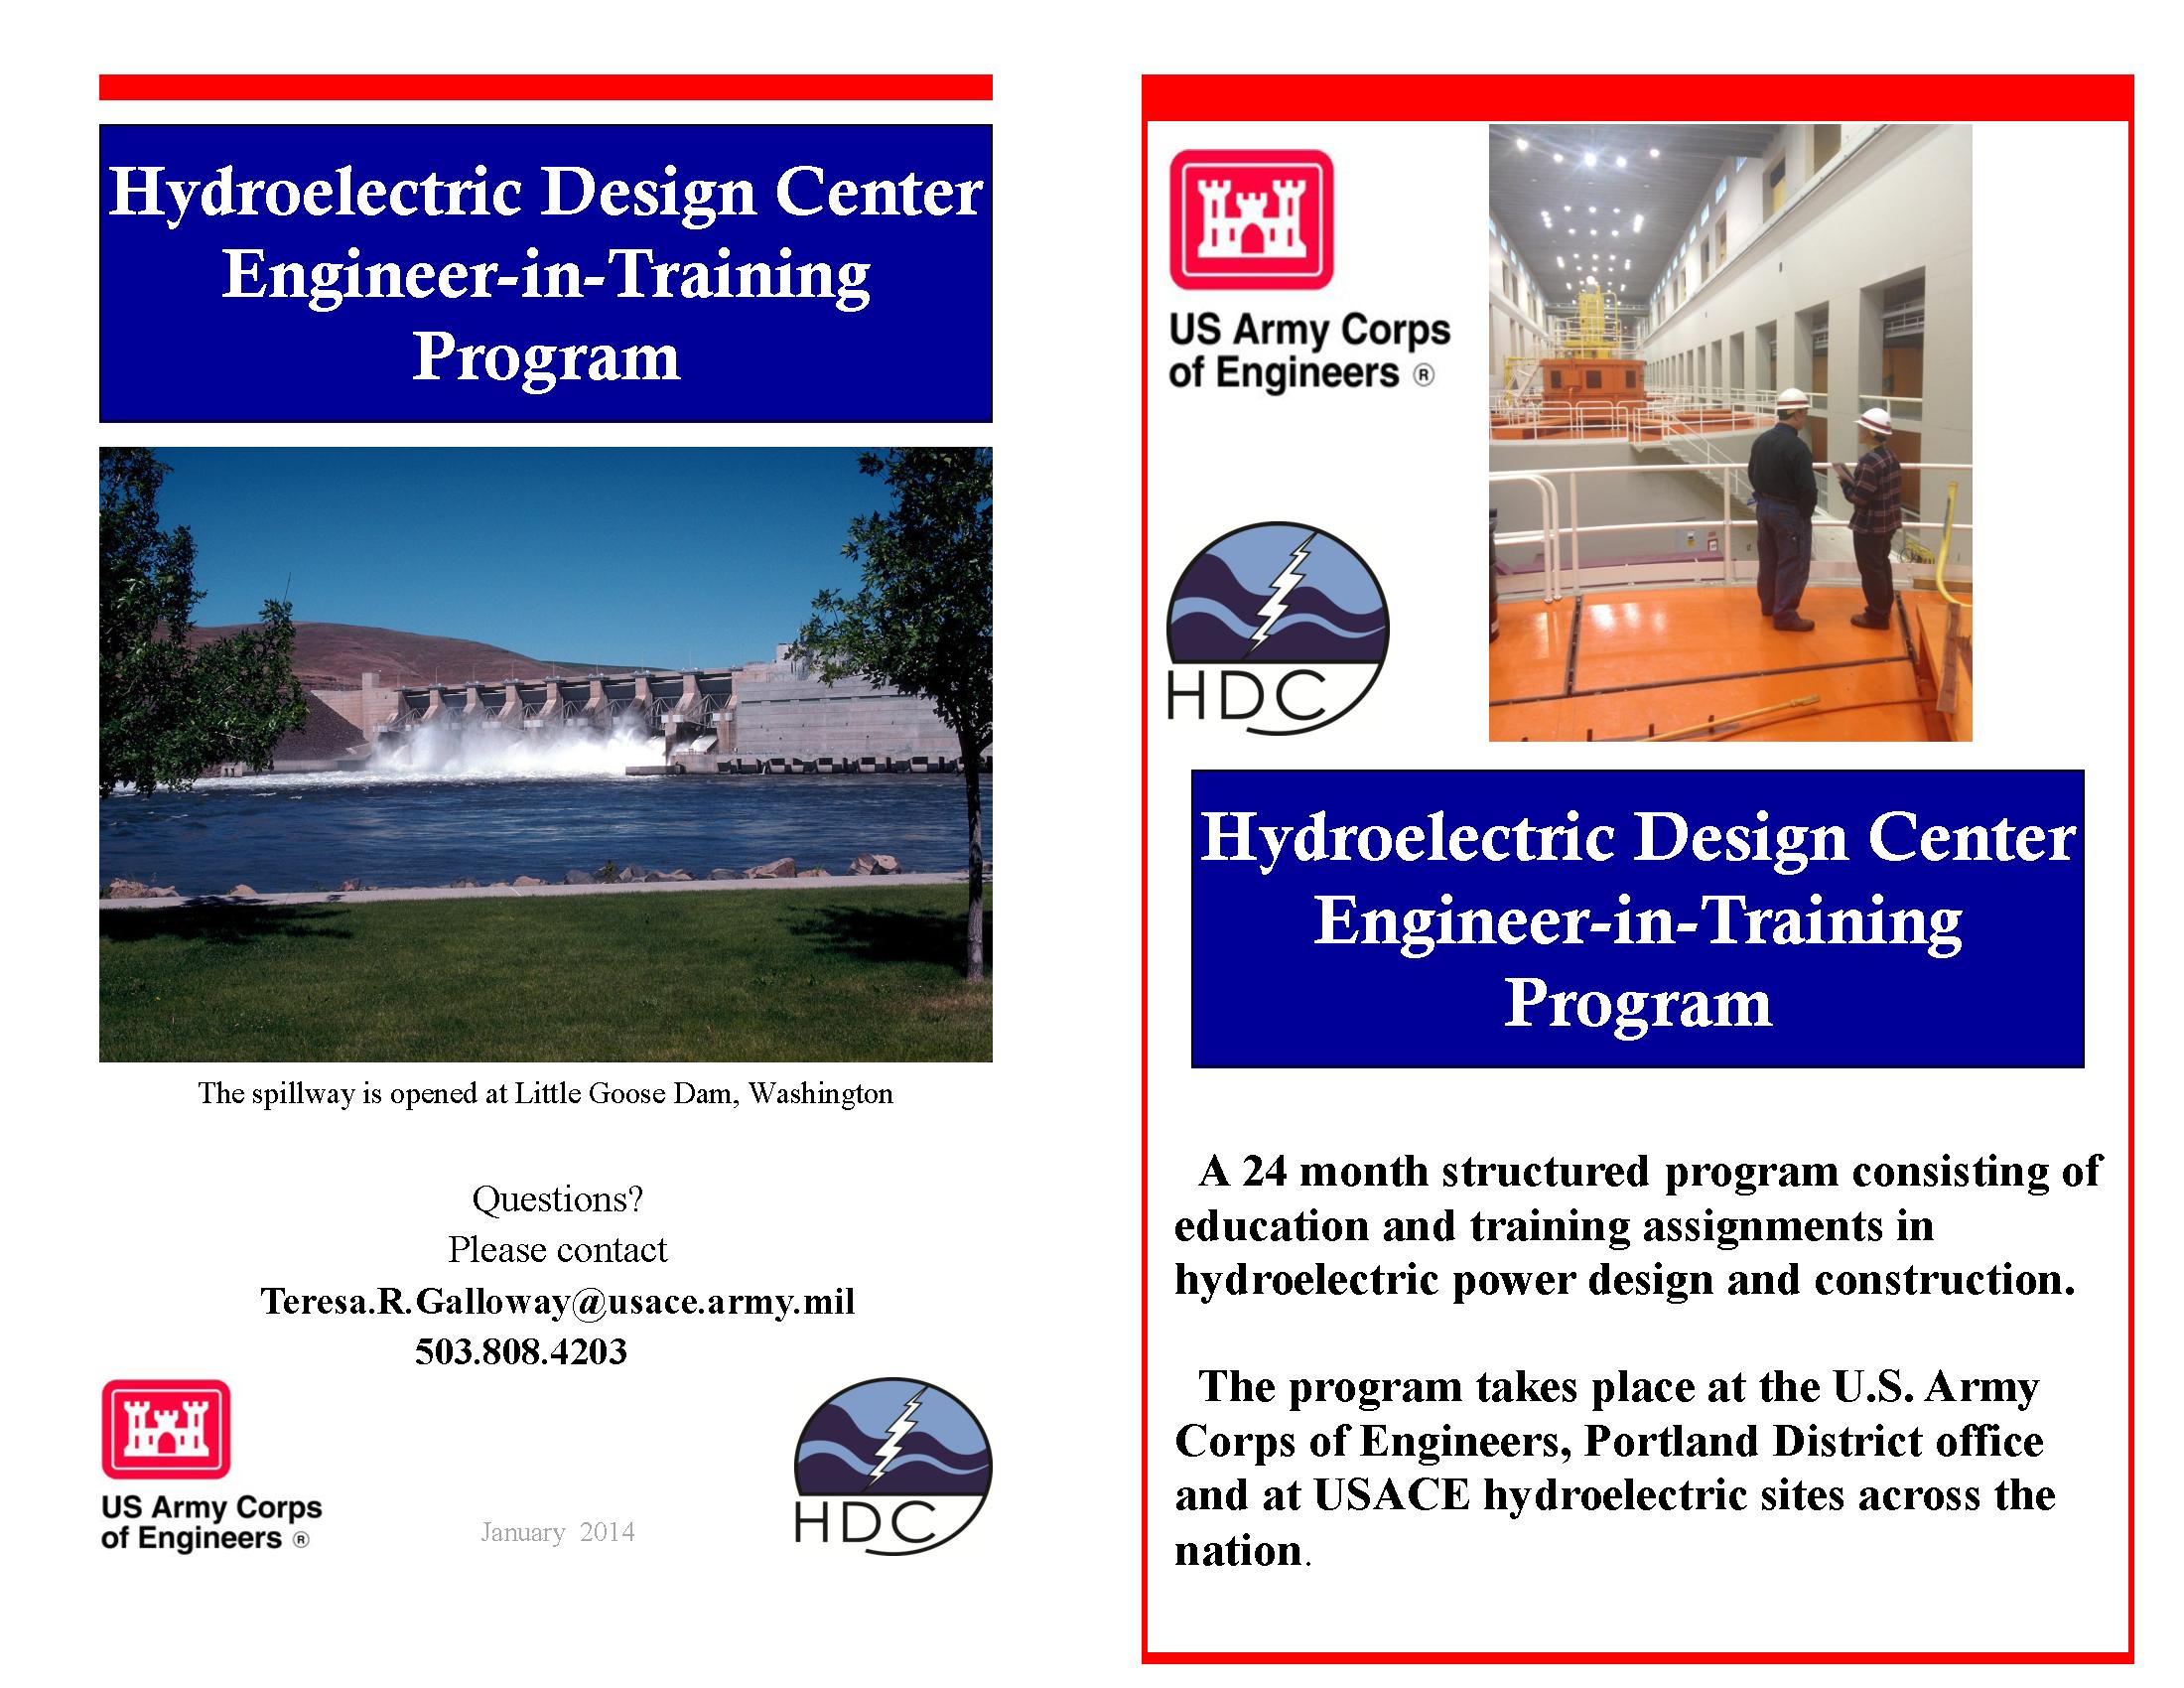 Hydroelectric Design Center Engineer-in-Training program